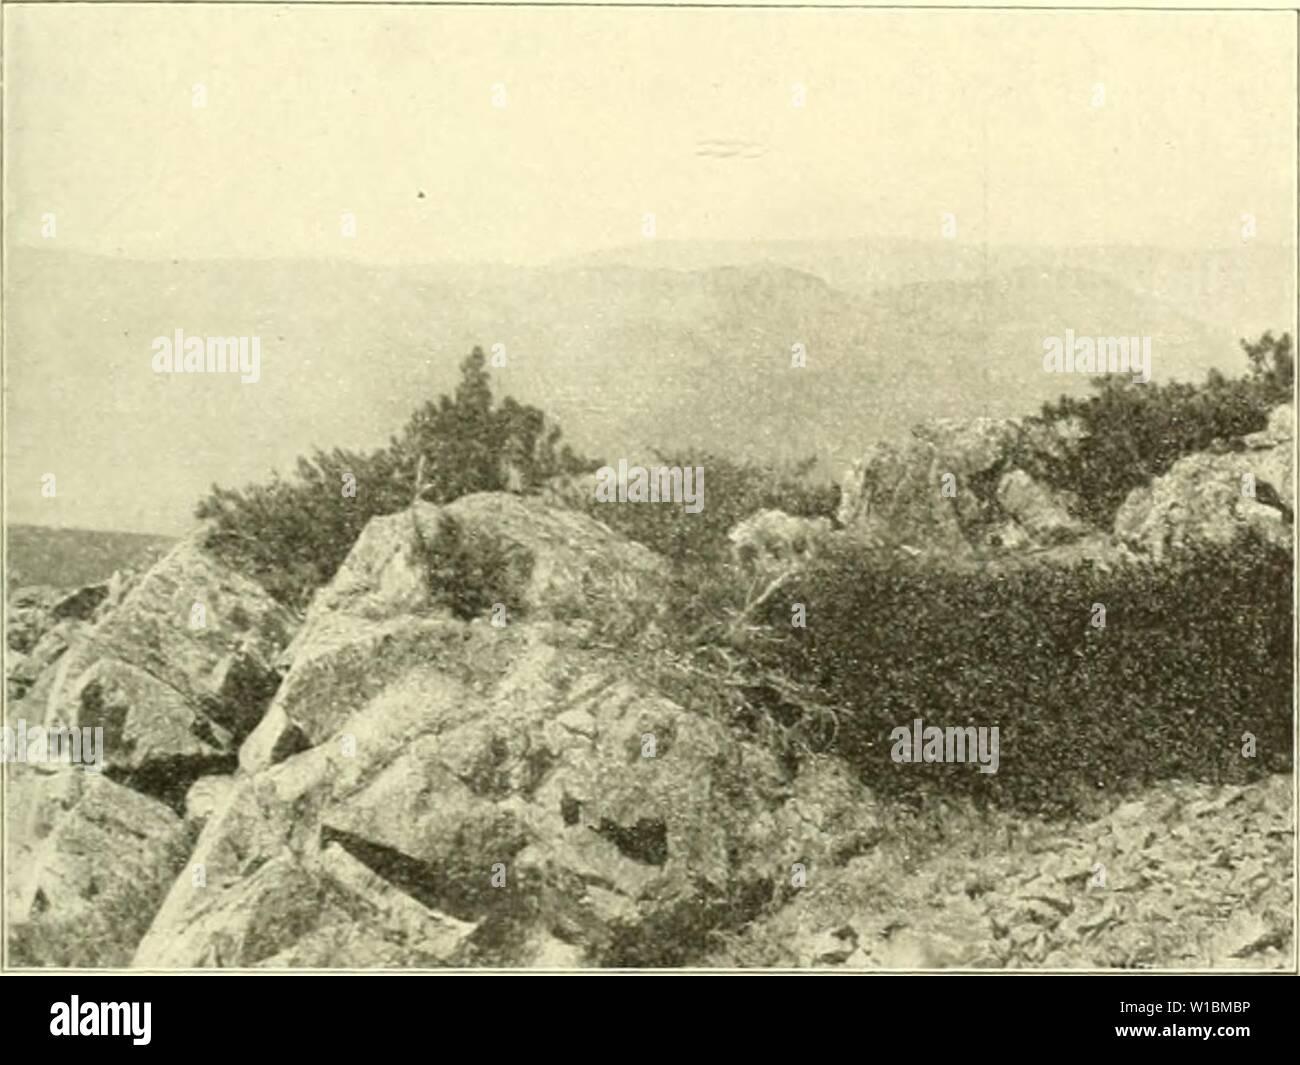 Immagine di archivio da pagina 428 di morire Arve in der Schweiz Foto Stock